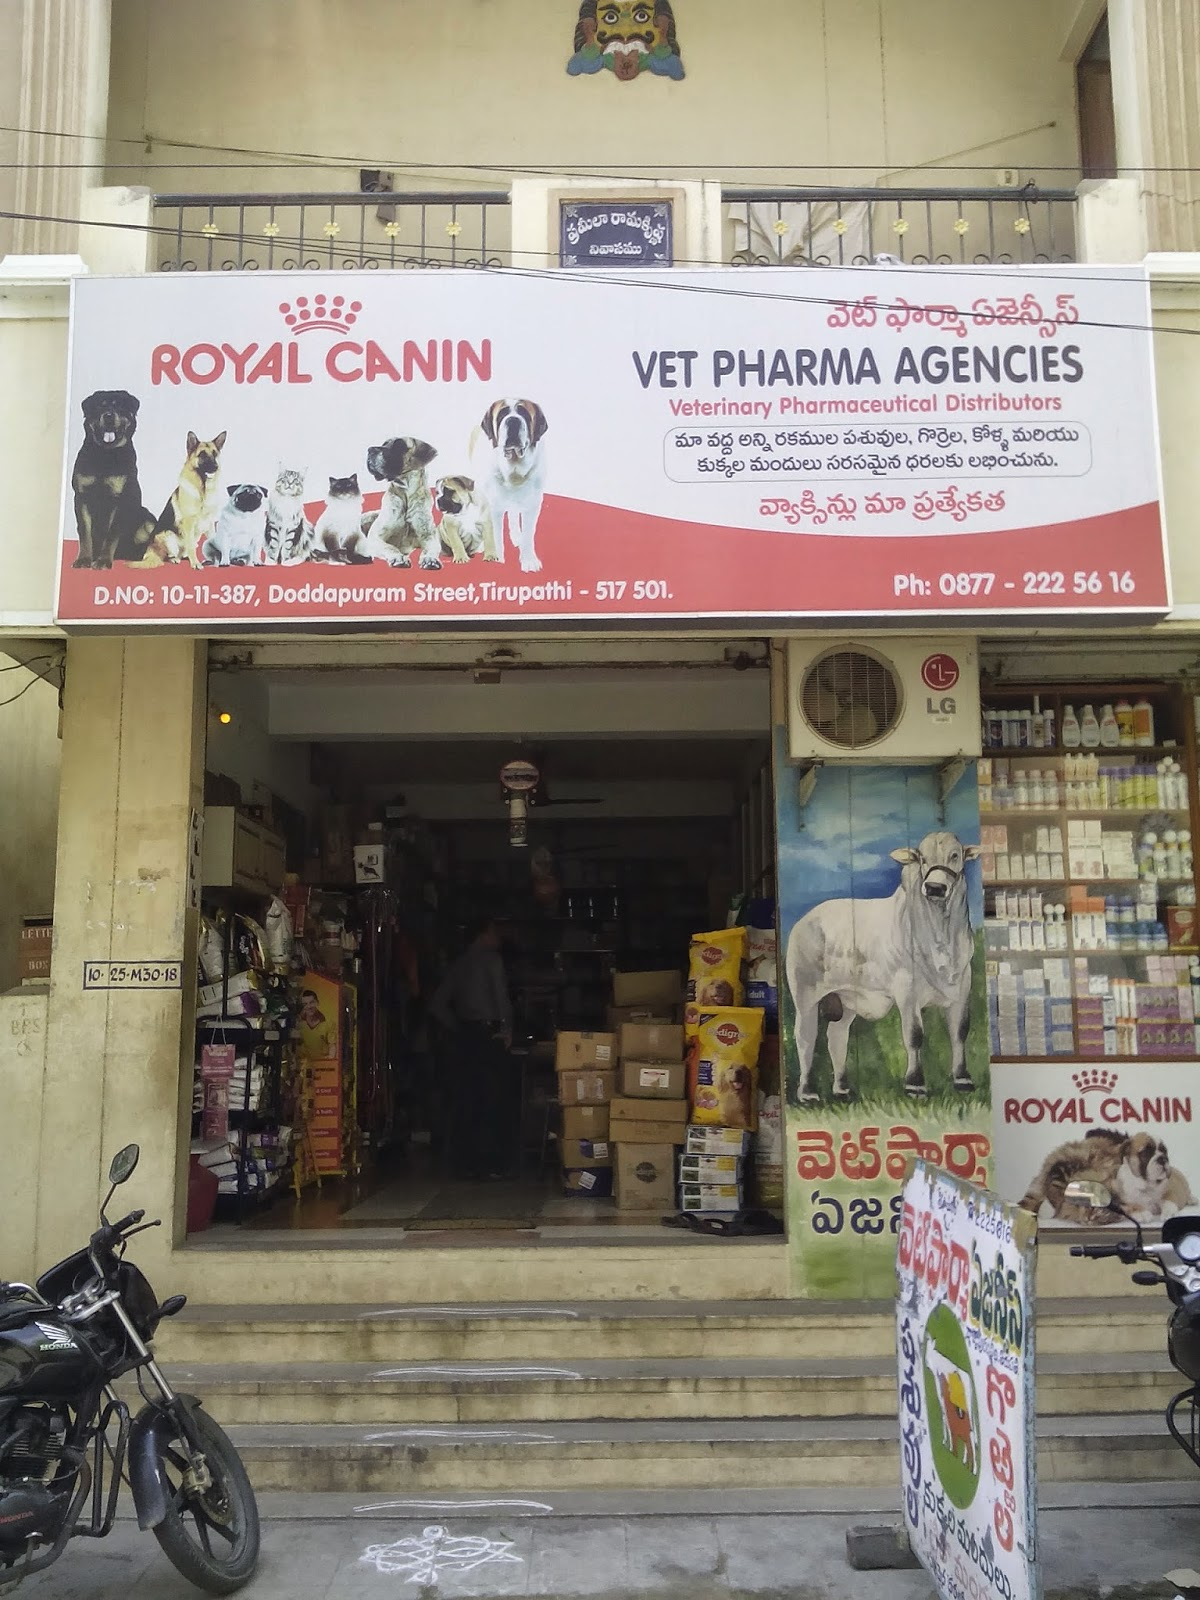 VET PHARMA AGENCIES TIRUPATI  DOG OOD TIRUPATI